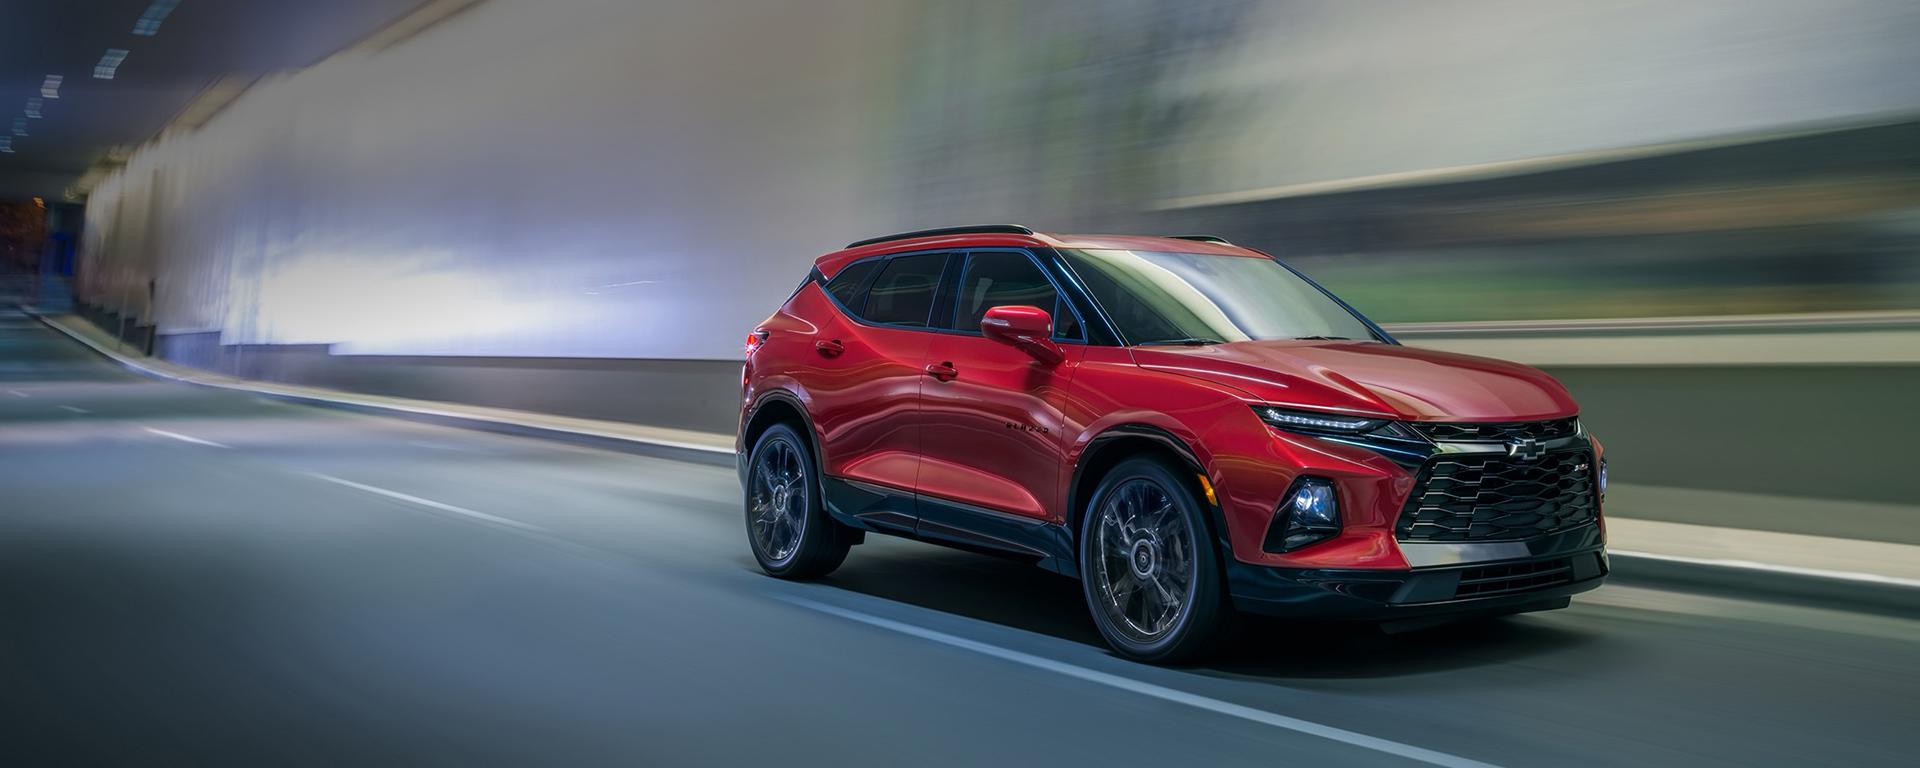 2020 Chevrolet Blazer Front Passenger 3/4 View